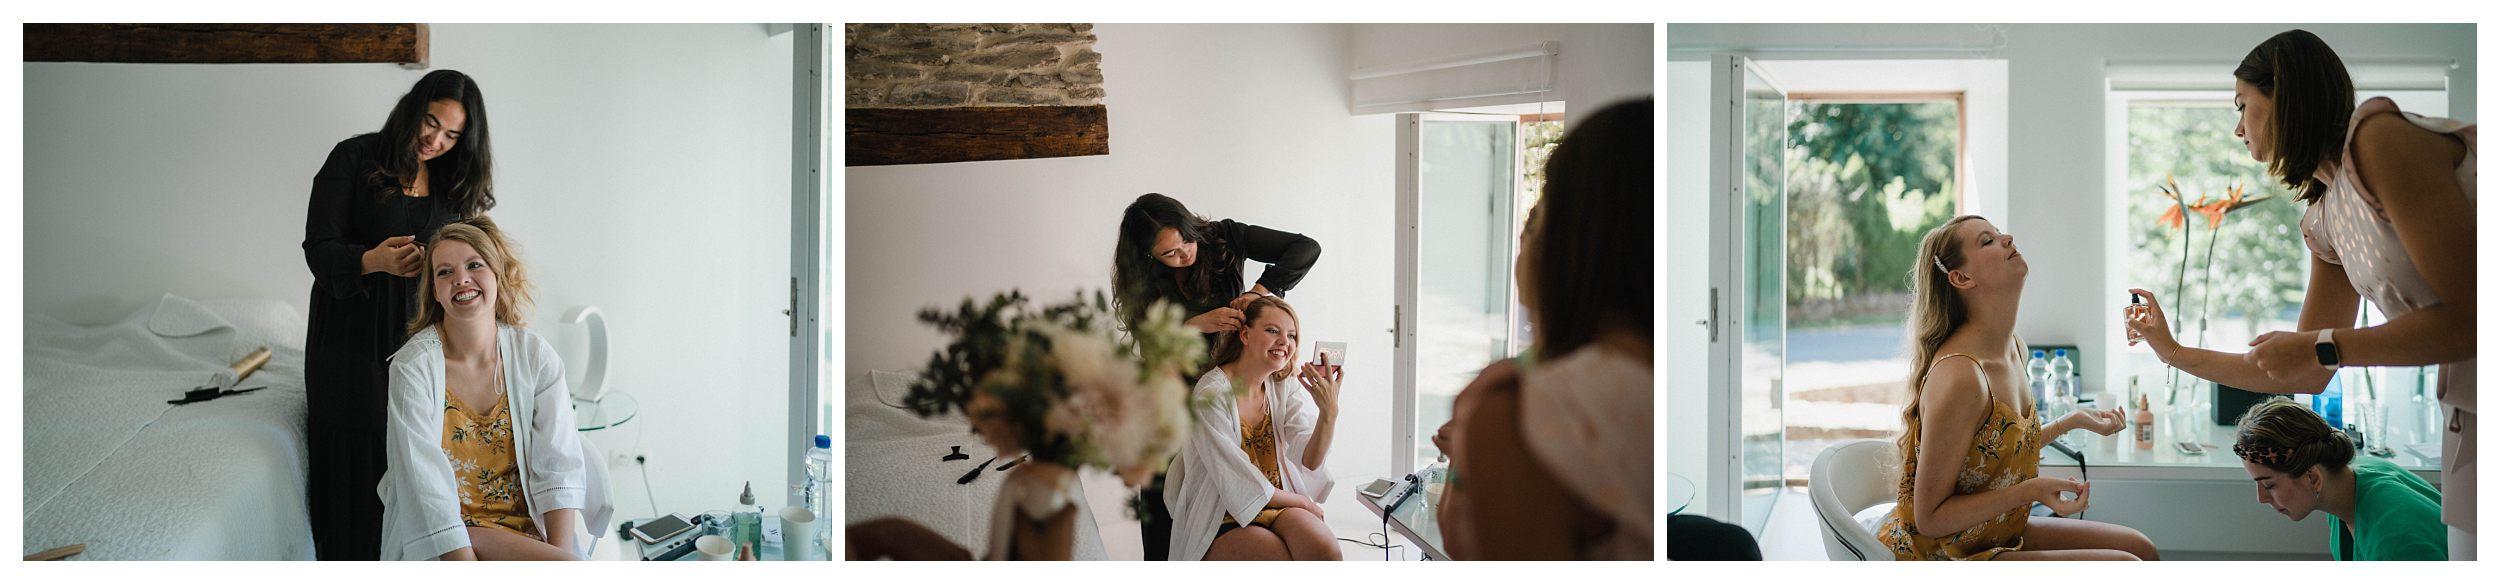 huwelijksfotograaf bruidsfotograaf destinationwedding huwelijksfotografie in ardennen nederland (12).jpg